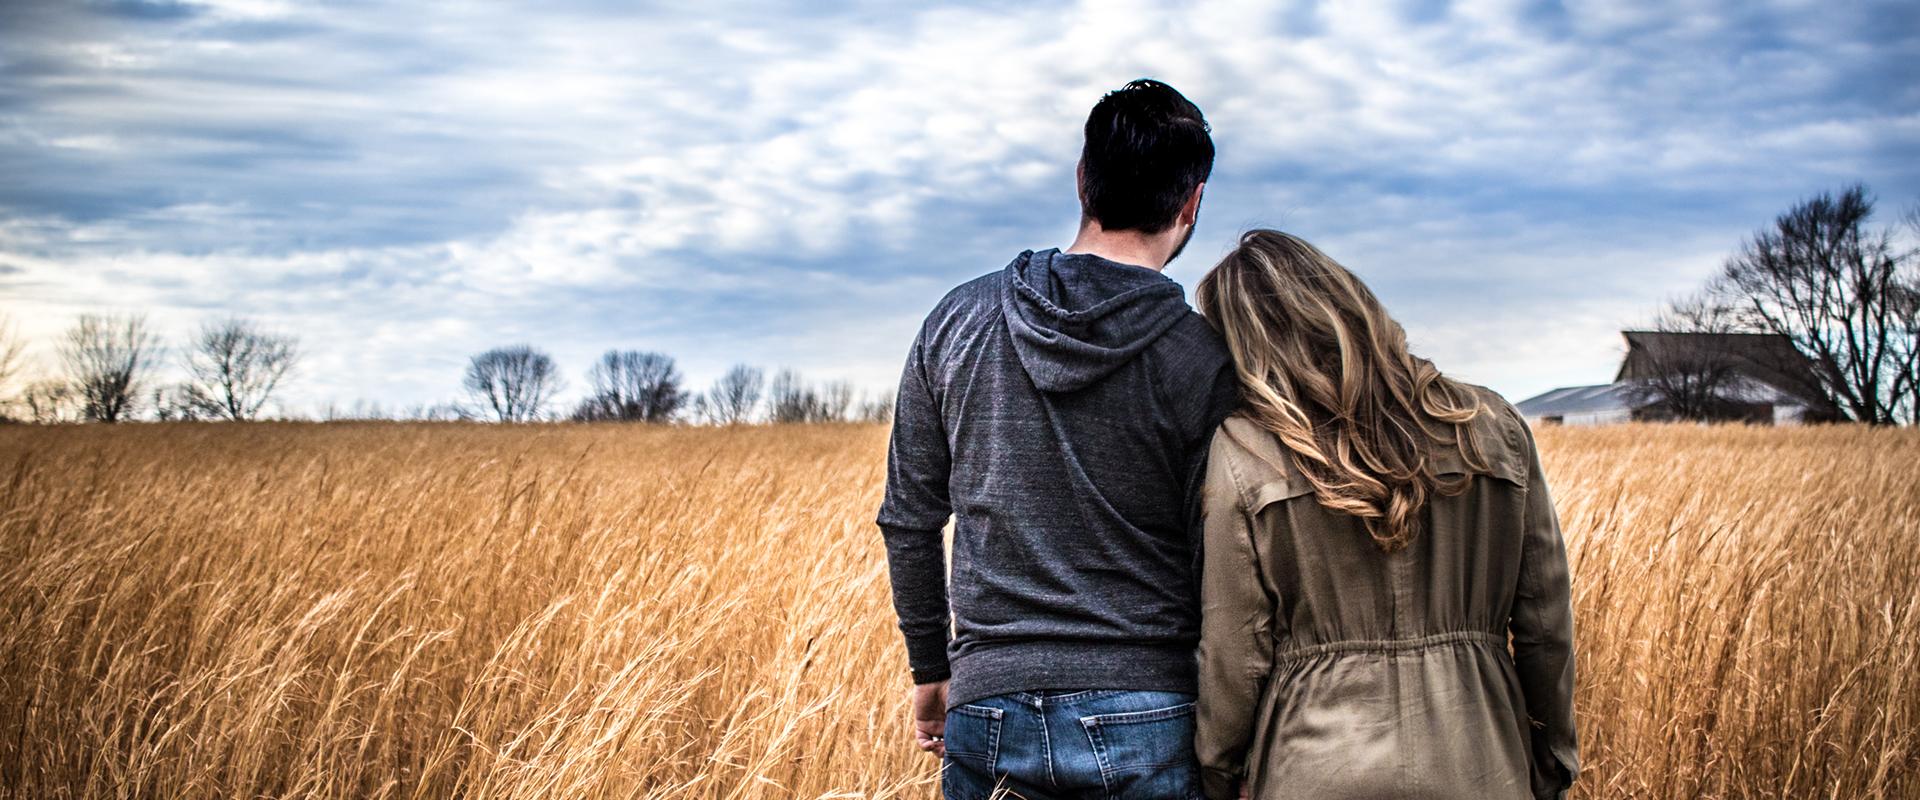 Draper Utah Couples Therapy couple 3